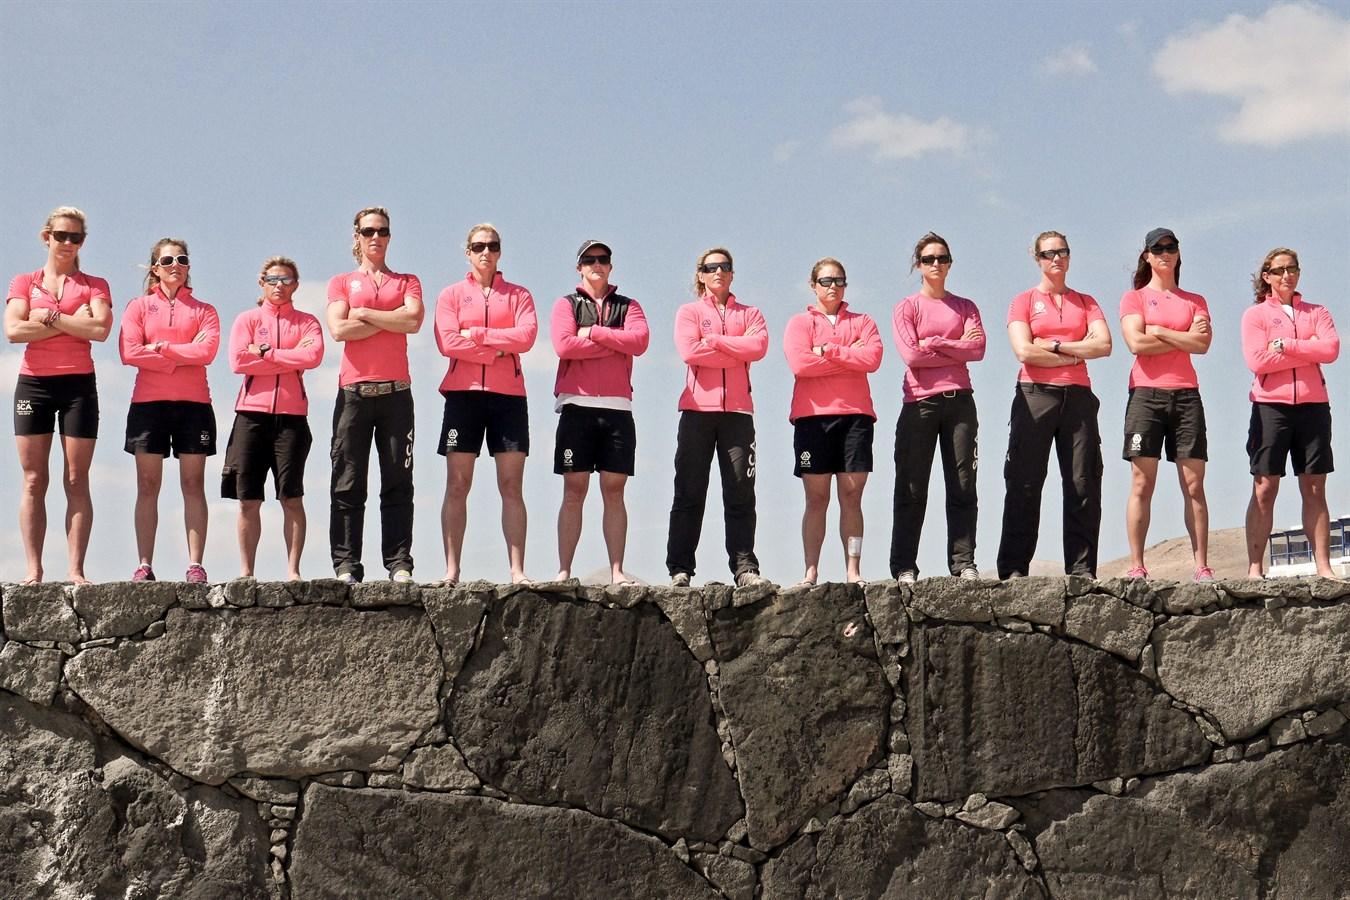 Volvo Ocean Race 2014-15 / Team SCA, premier équipage 100% féminin